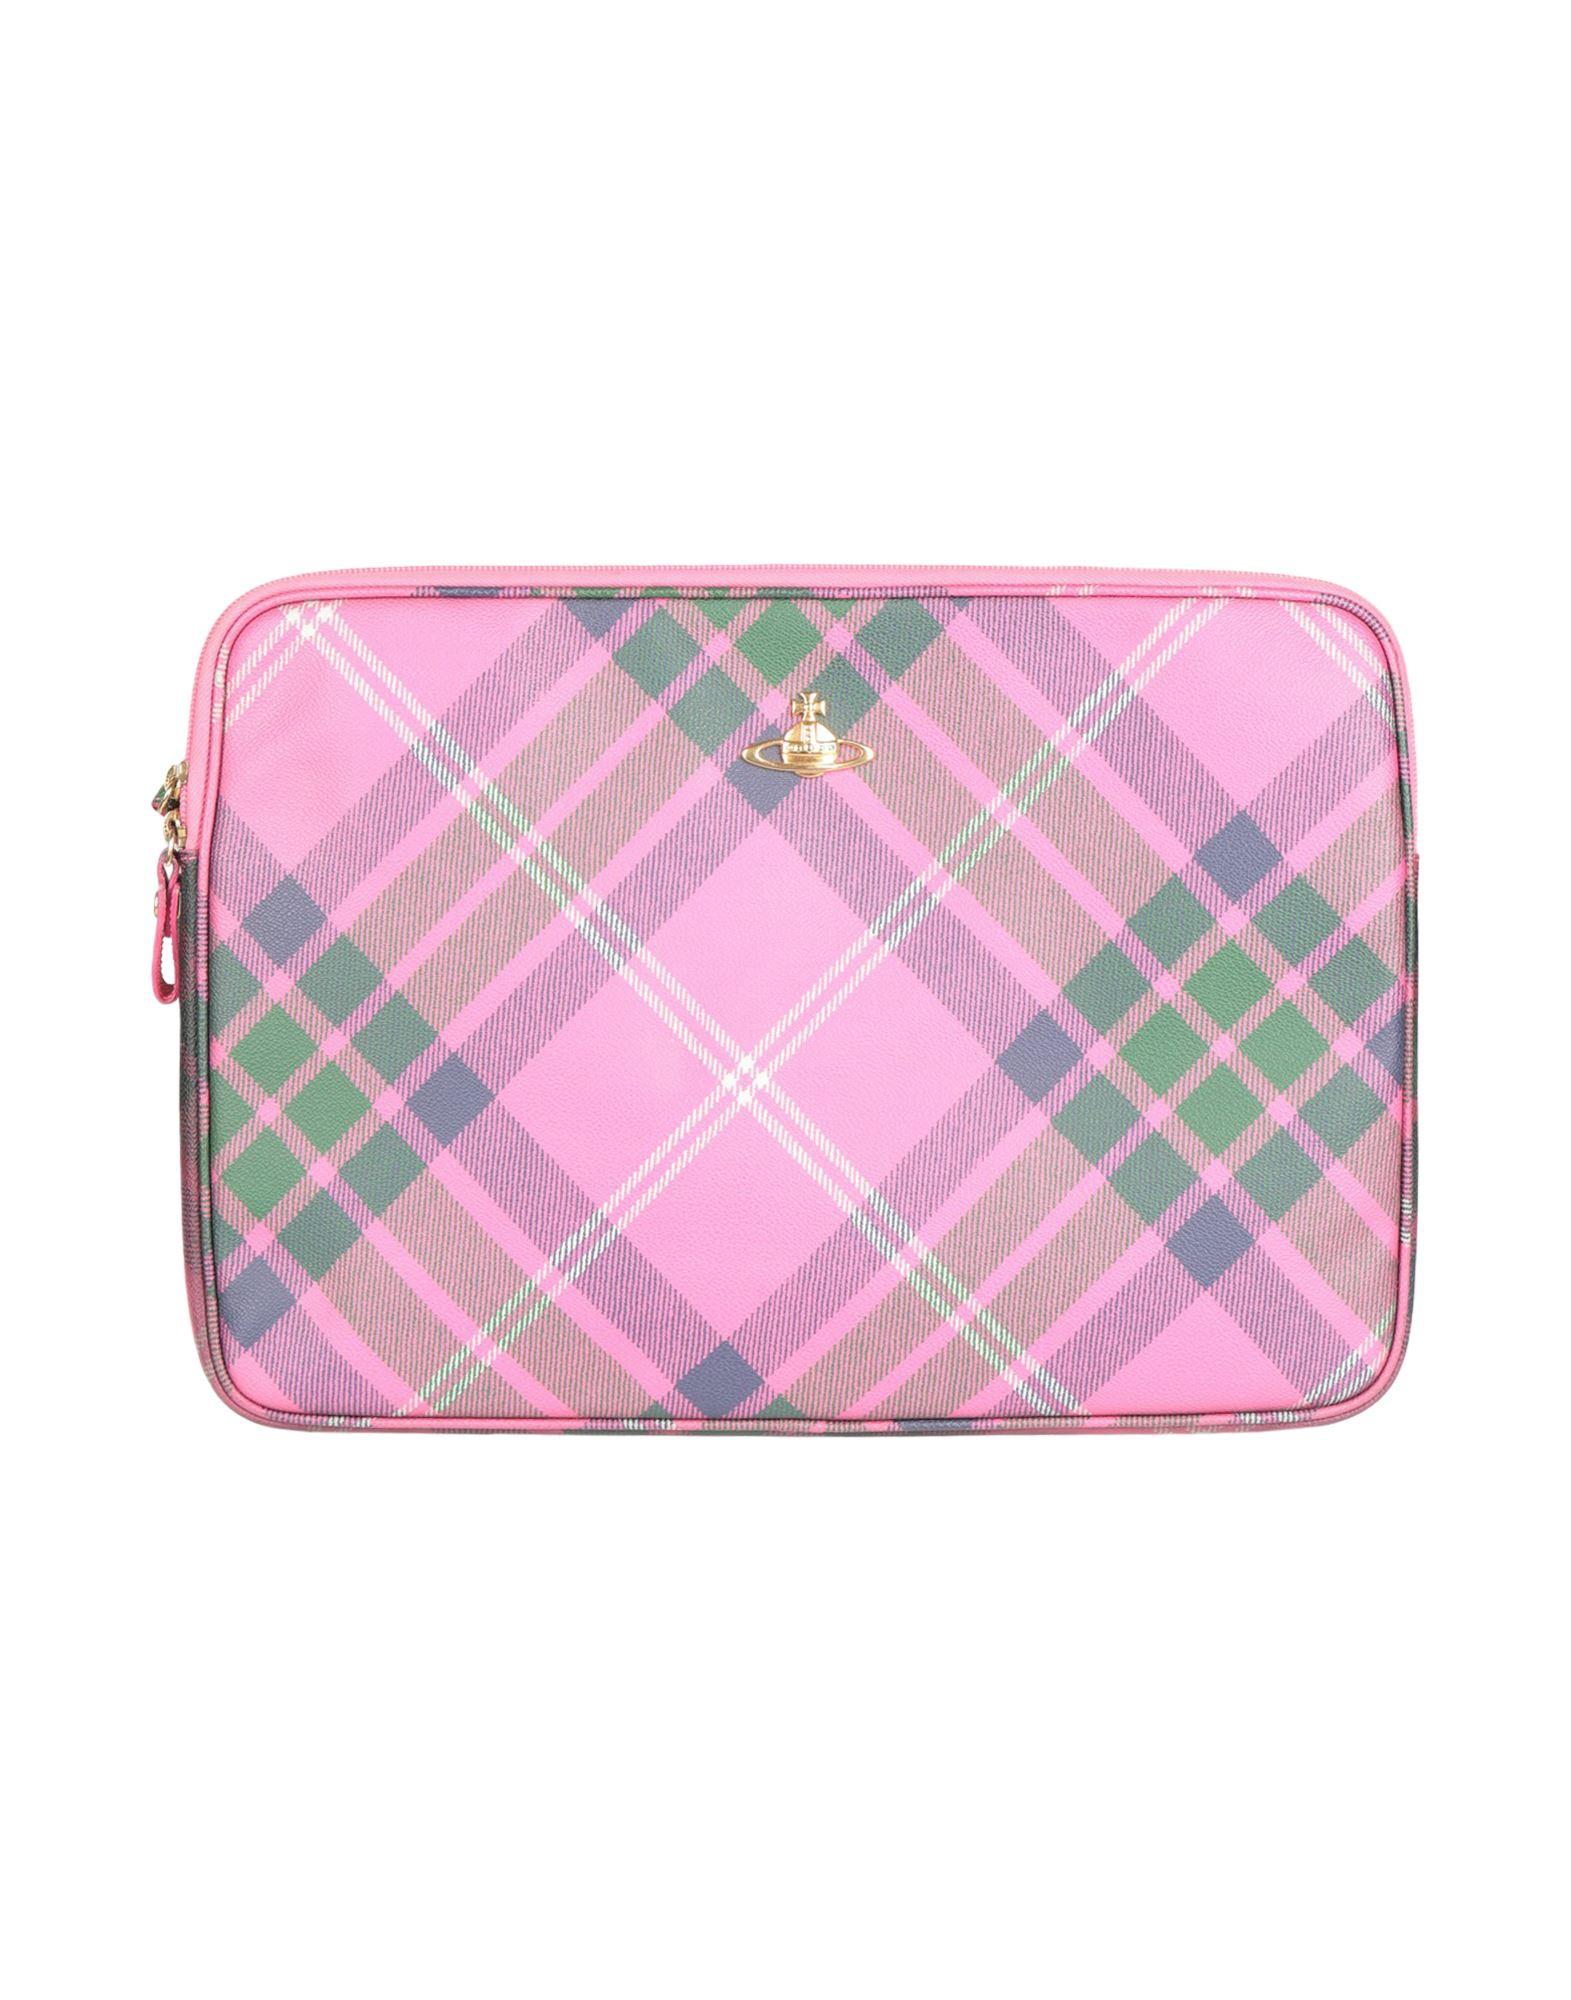 kipling деловые сумки VIVIENNE WESTWOOD Деловые сумки